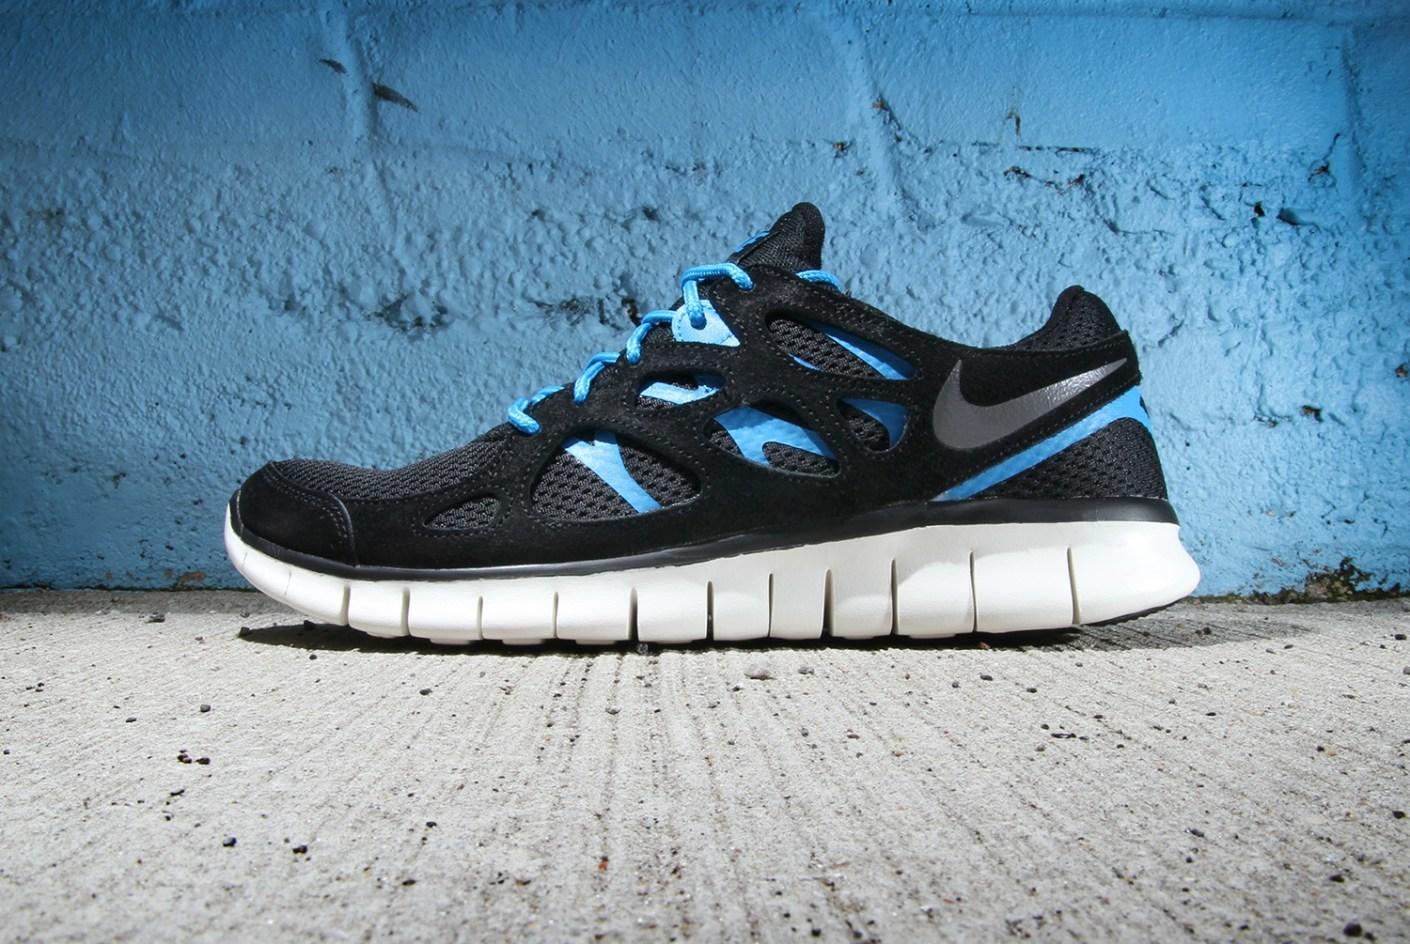 Image of Nike Free Run+ 2 Black/Dark Grey-Black-Blue Hero